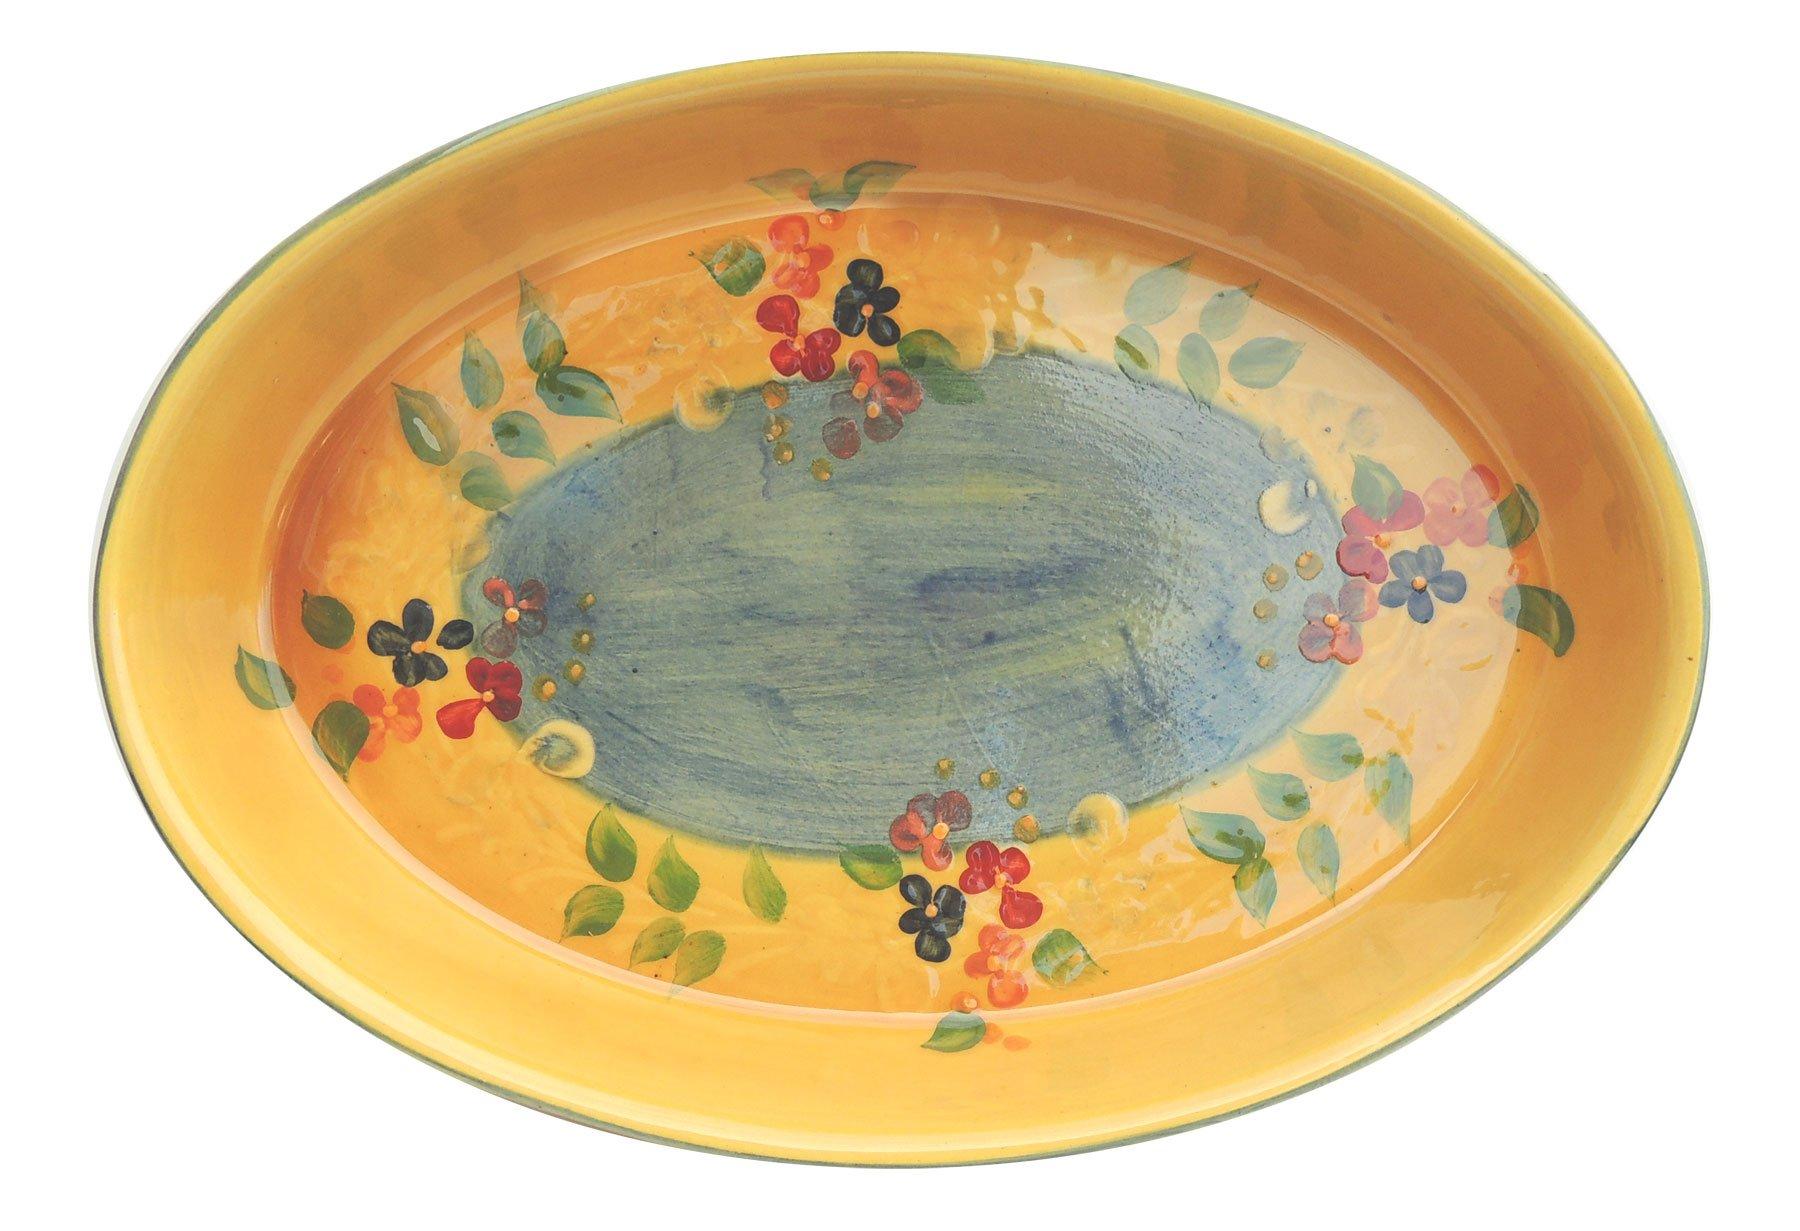 Souleo Provence Pottery - Oval Gratin Dish - Provence